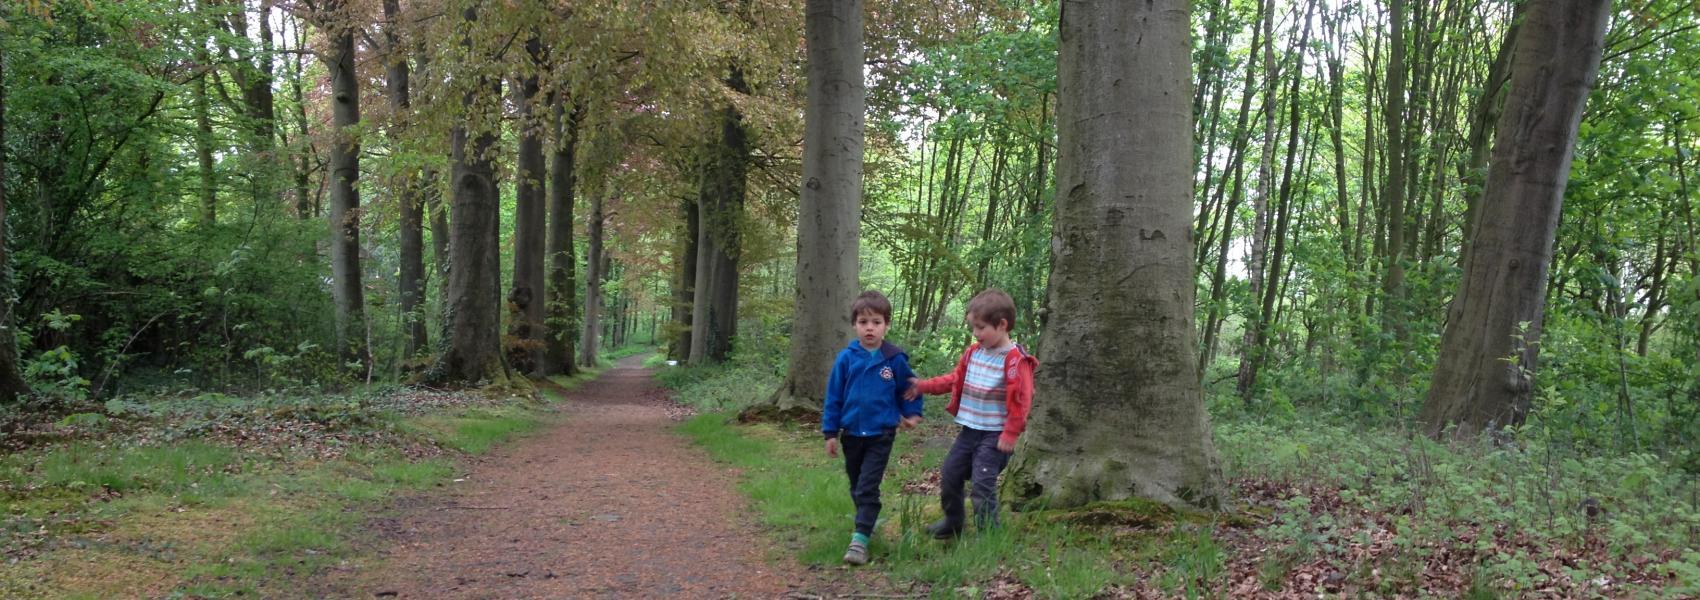 Vinderhoutse bossen - Griet Buyse